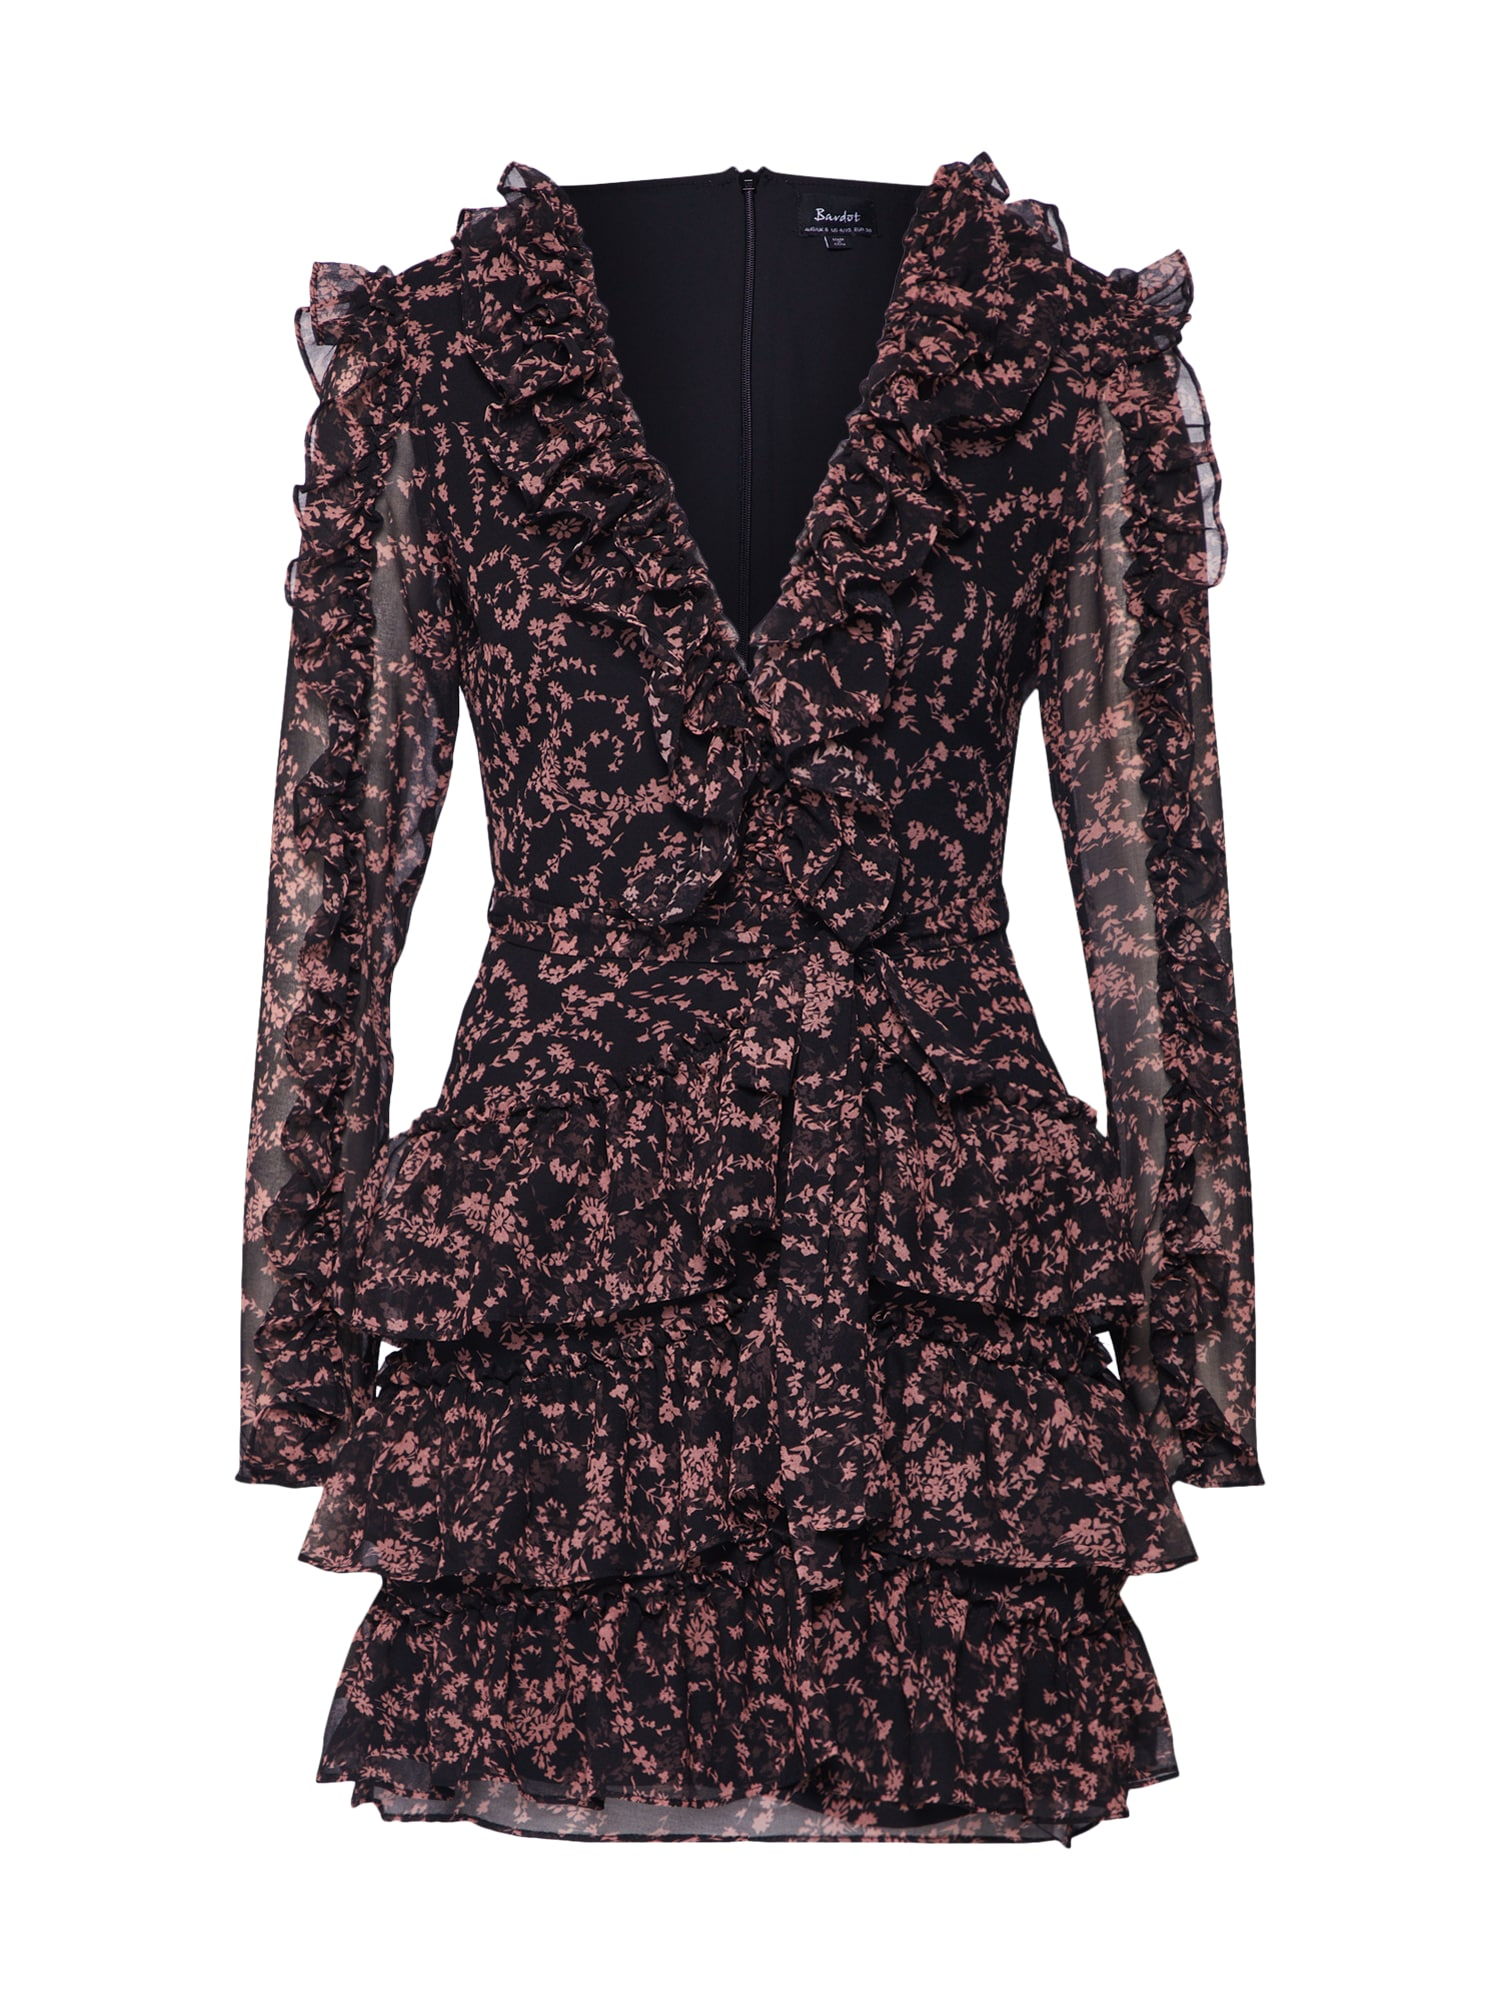 Šaty ALESSIA FRILL DRESS starorůžová černá Bardot